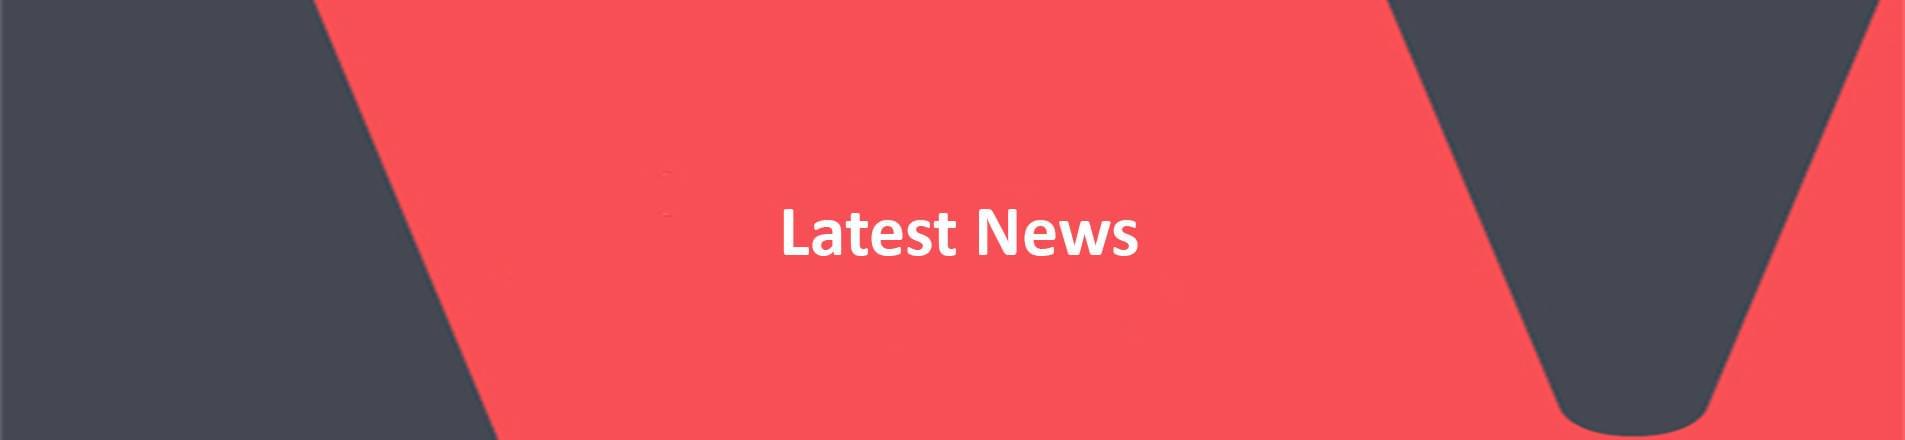 Words Latest news on VERCIDA branded background